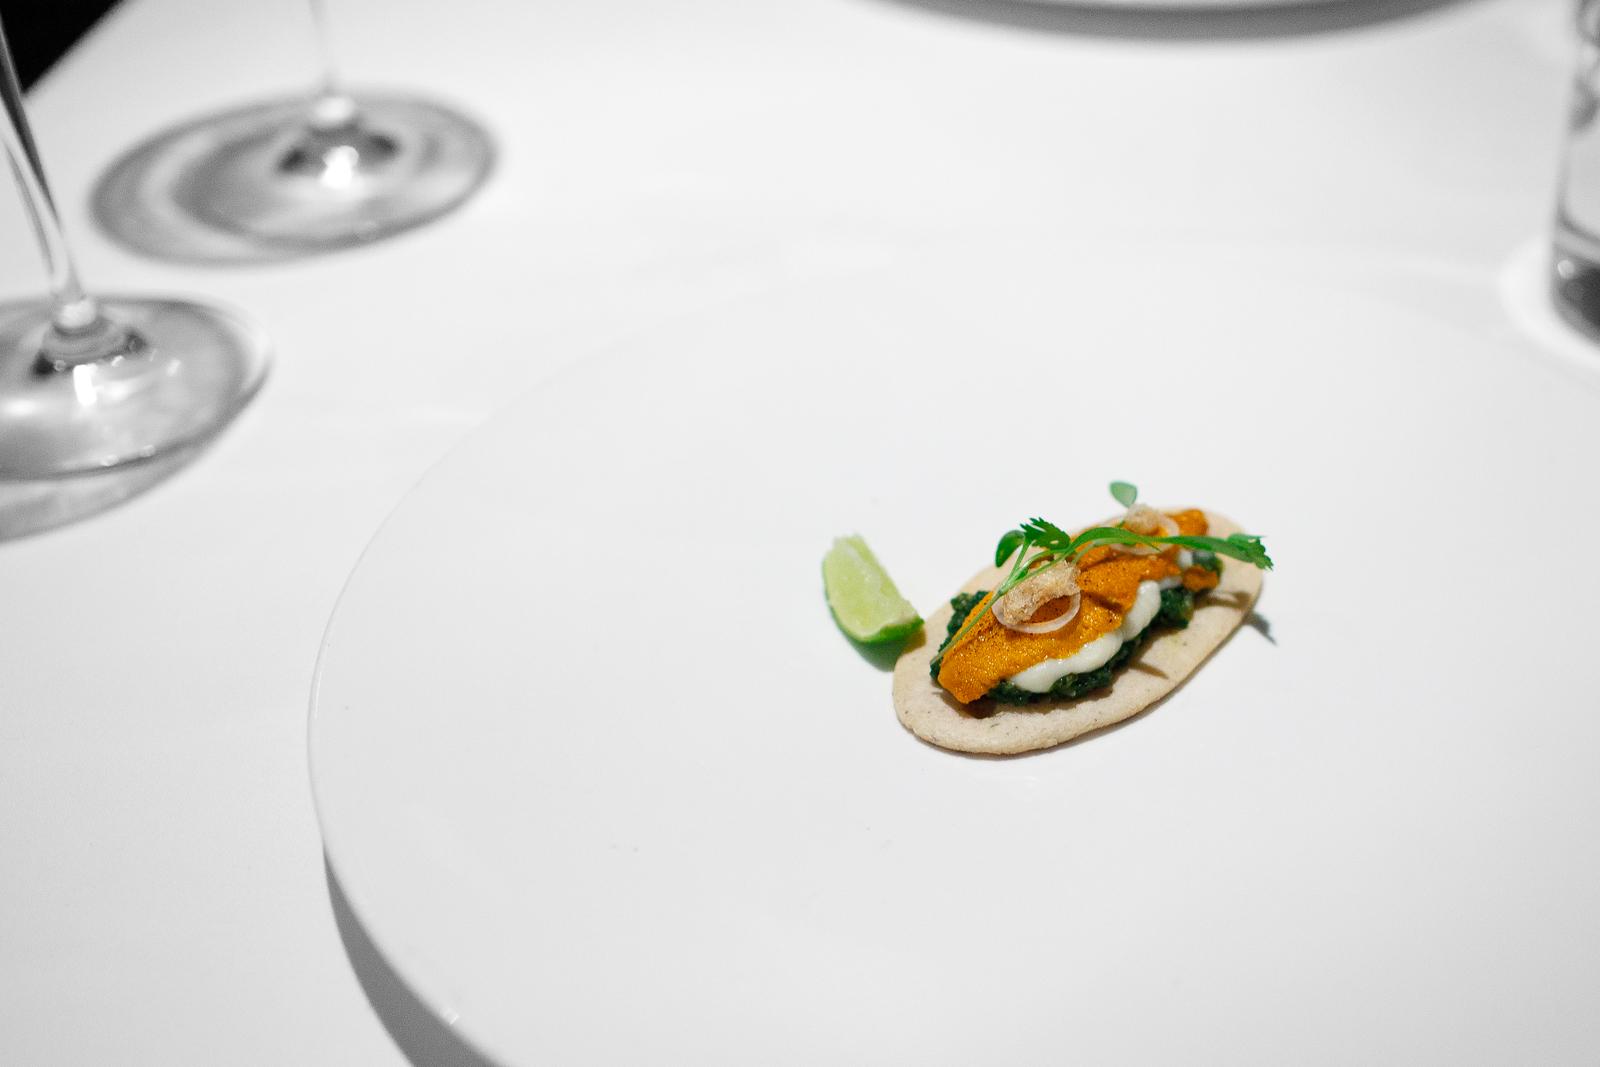 5th Course: Sope de erizo y papa, hoja de rábano tatemado (Sea urchin sope with potato purée, fire-toasted radish leaf)